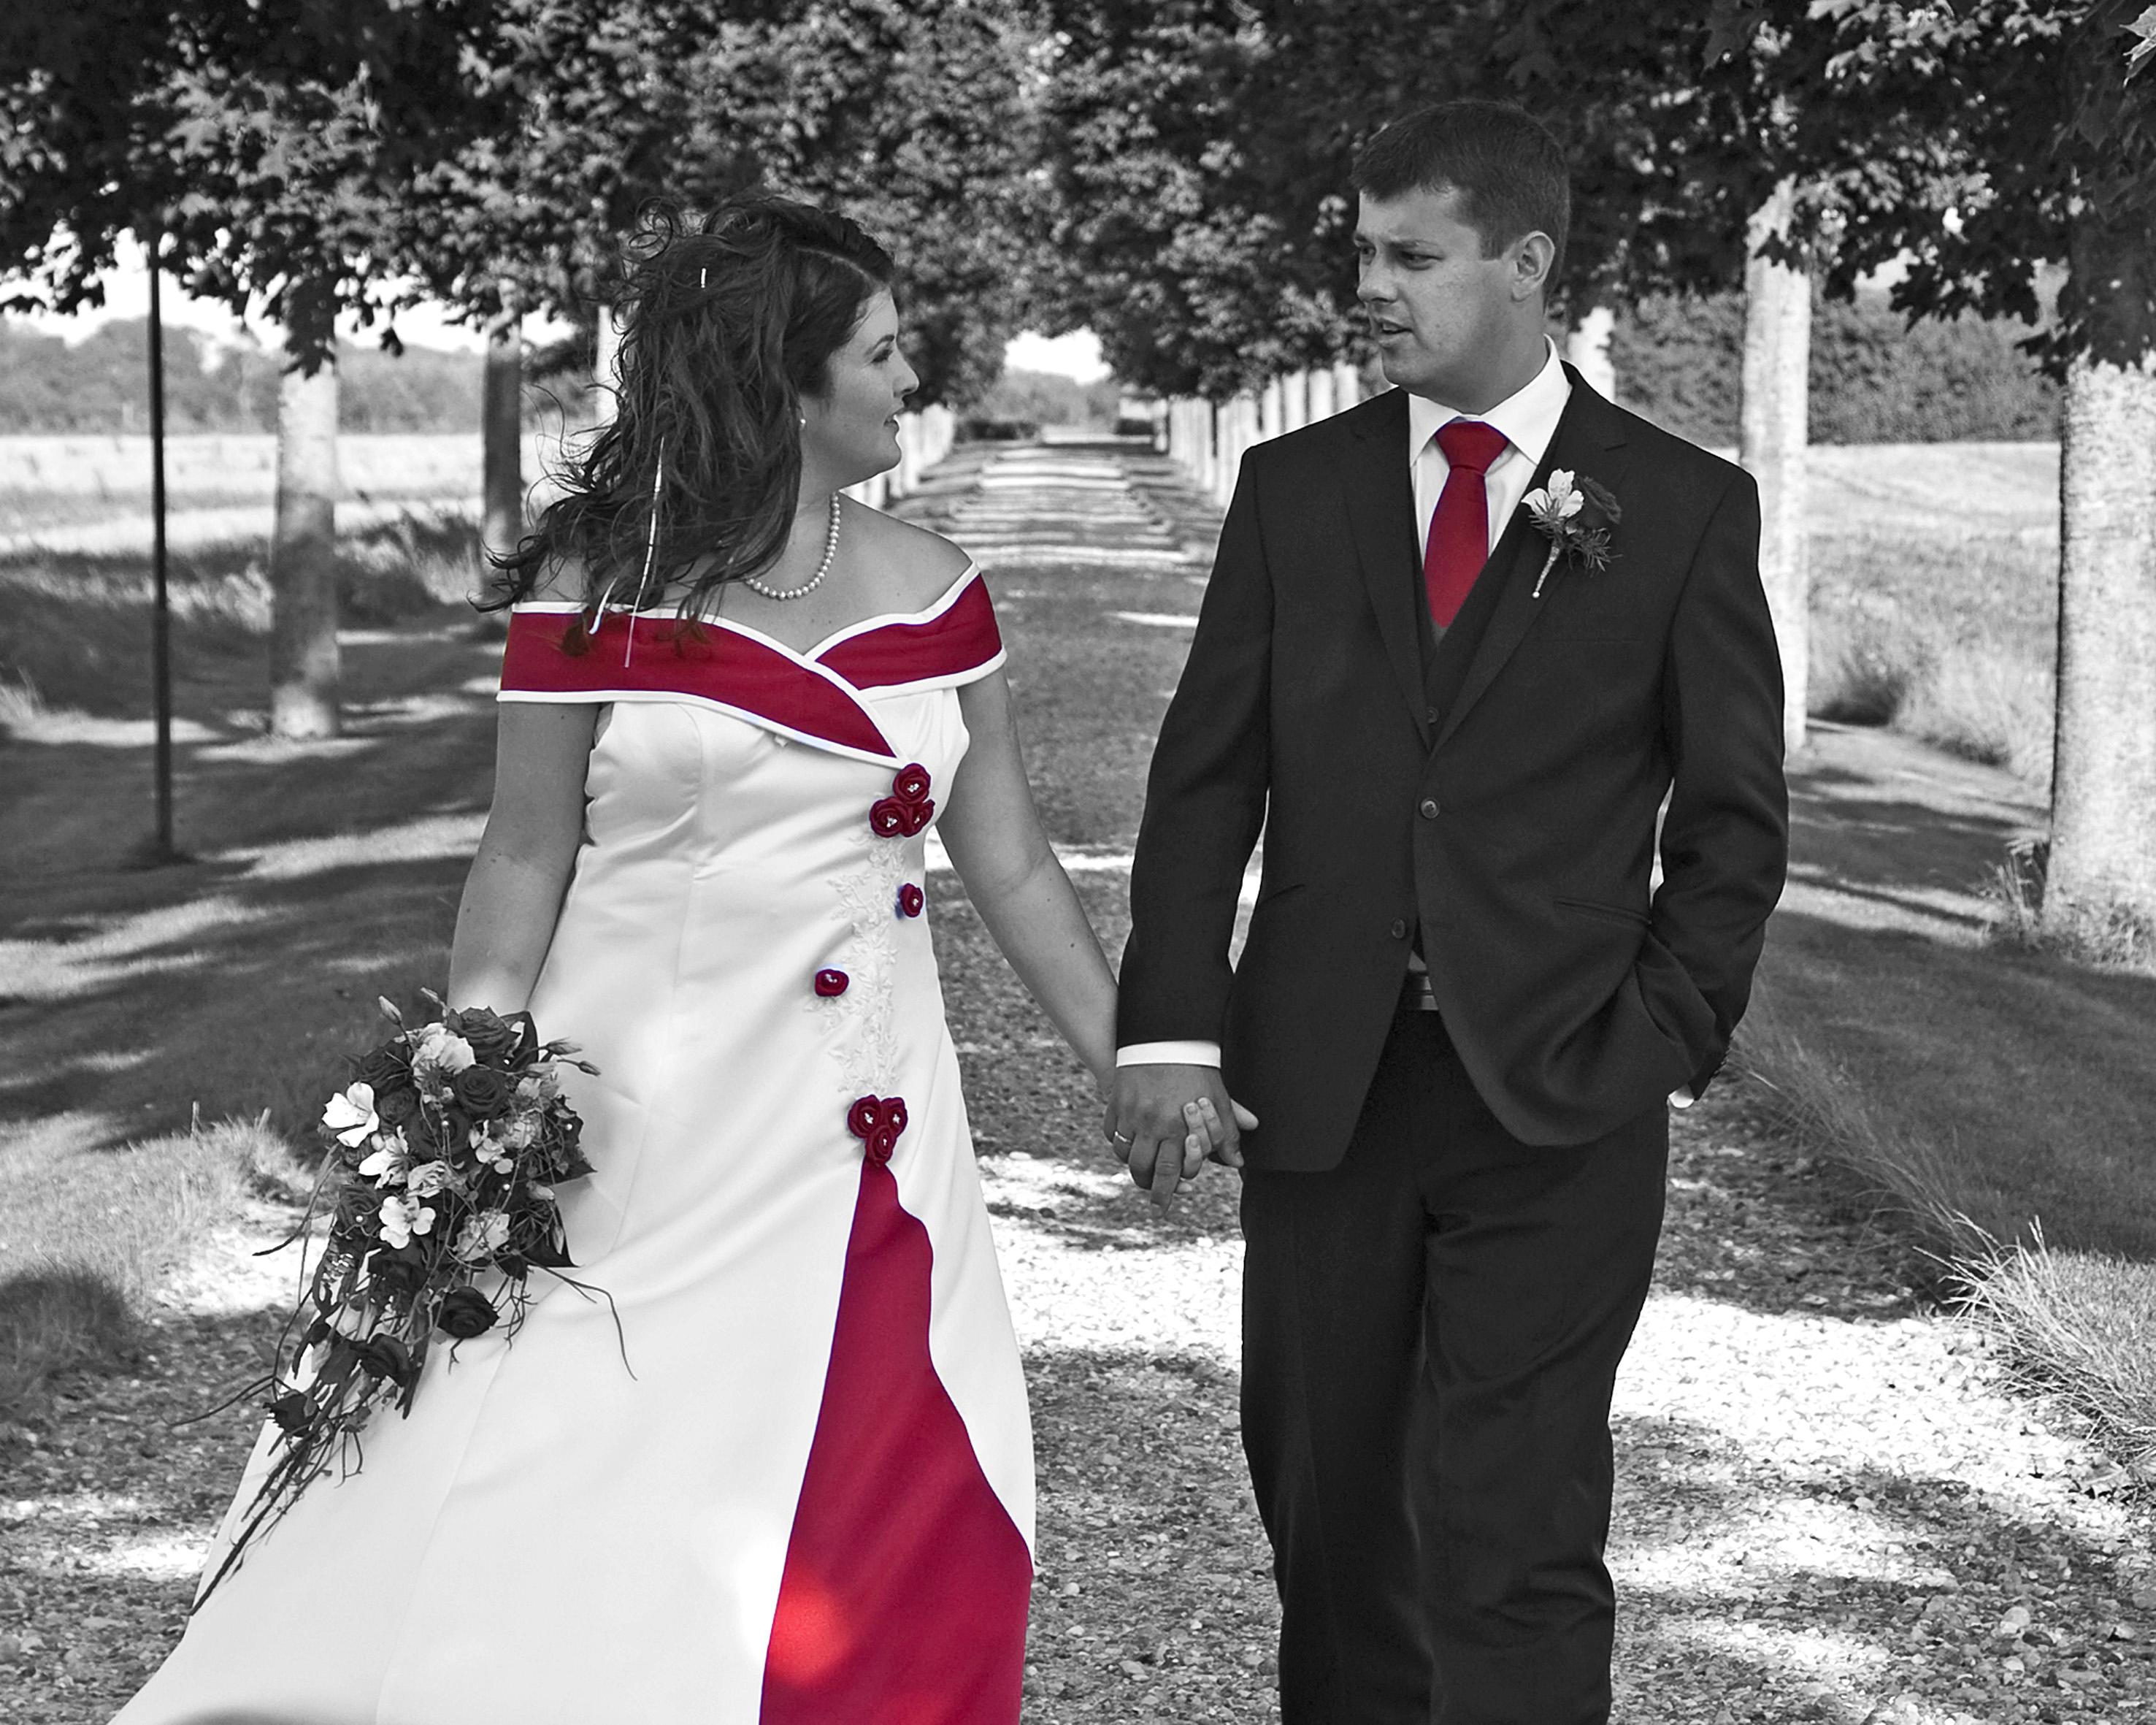 Bryllupsfotografering - Brudepar I Sort/hvid Med Farve